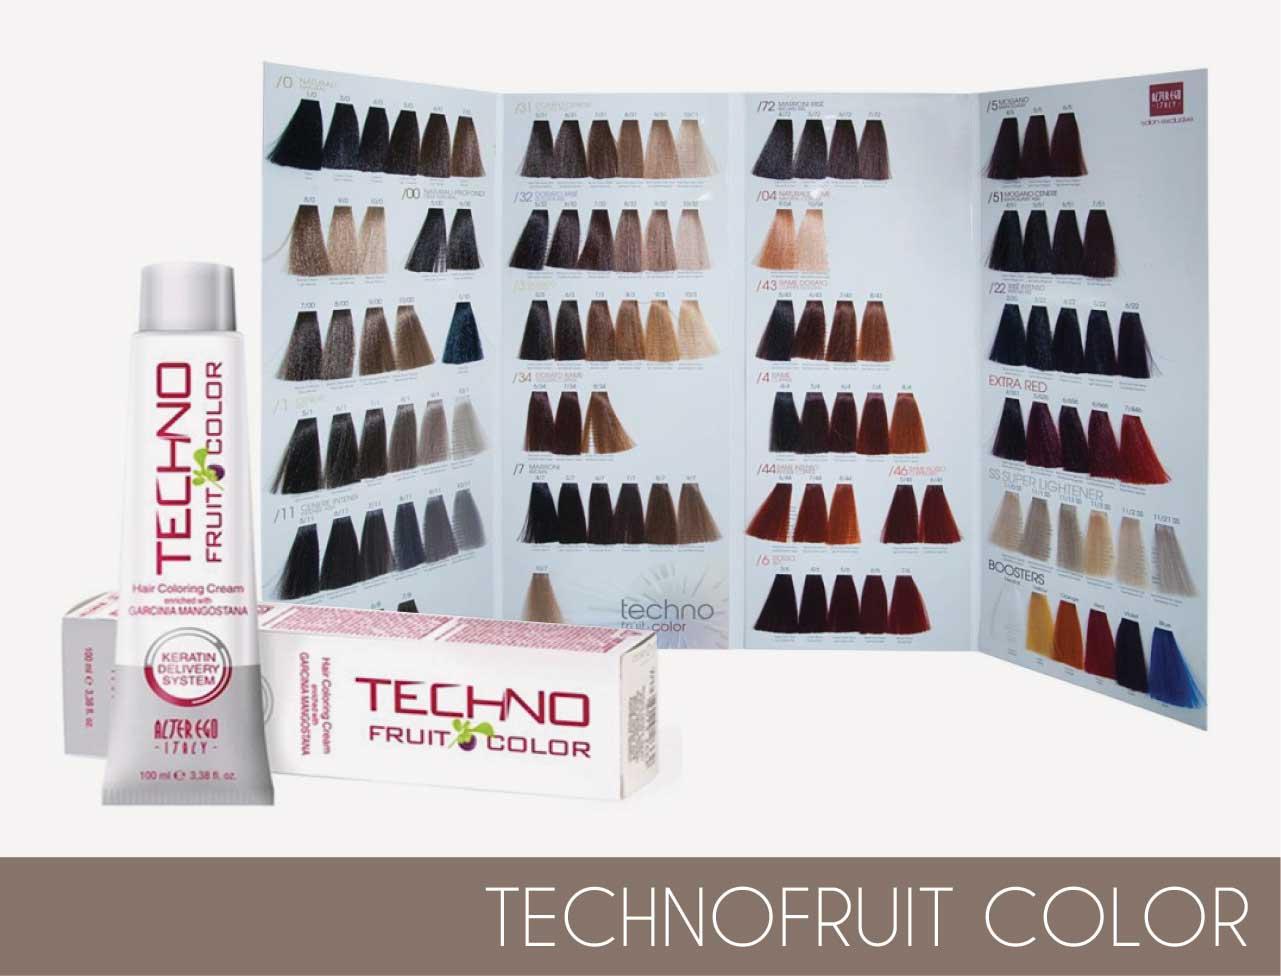 Alter Ego Краска для волос Techno Fruit 100мл Интернет